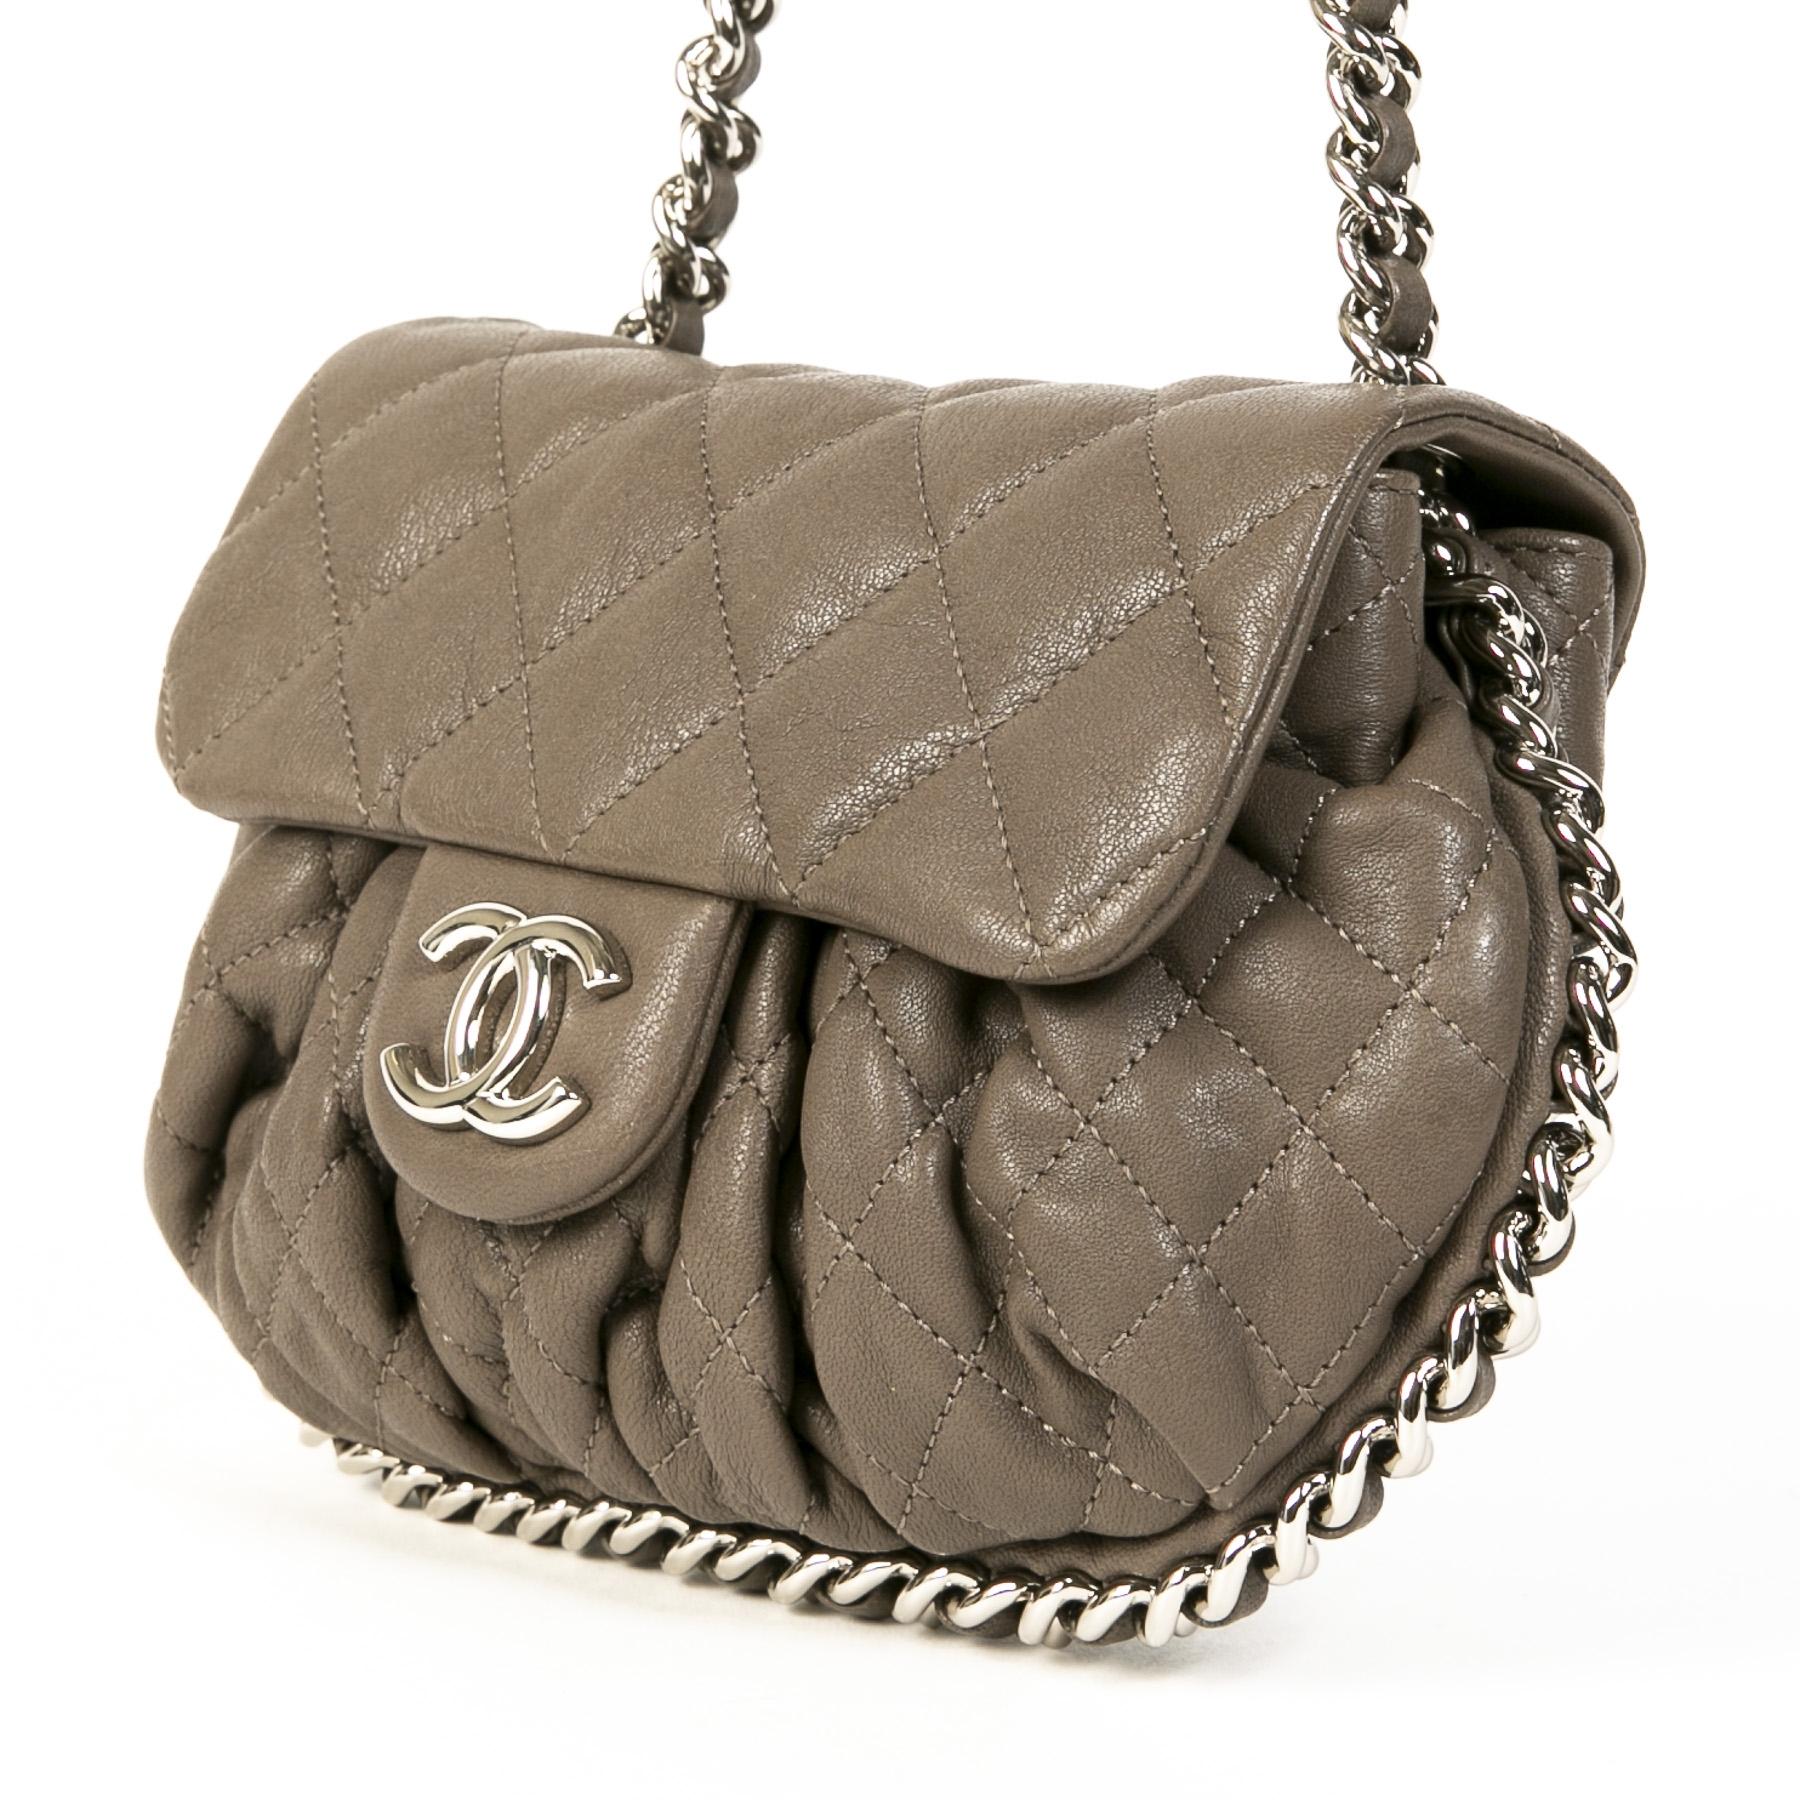 Authentieke tweedehands vintage Chanel Chain Around Taupe Crossbody Bag koop online webshop LabelLOV